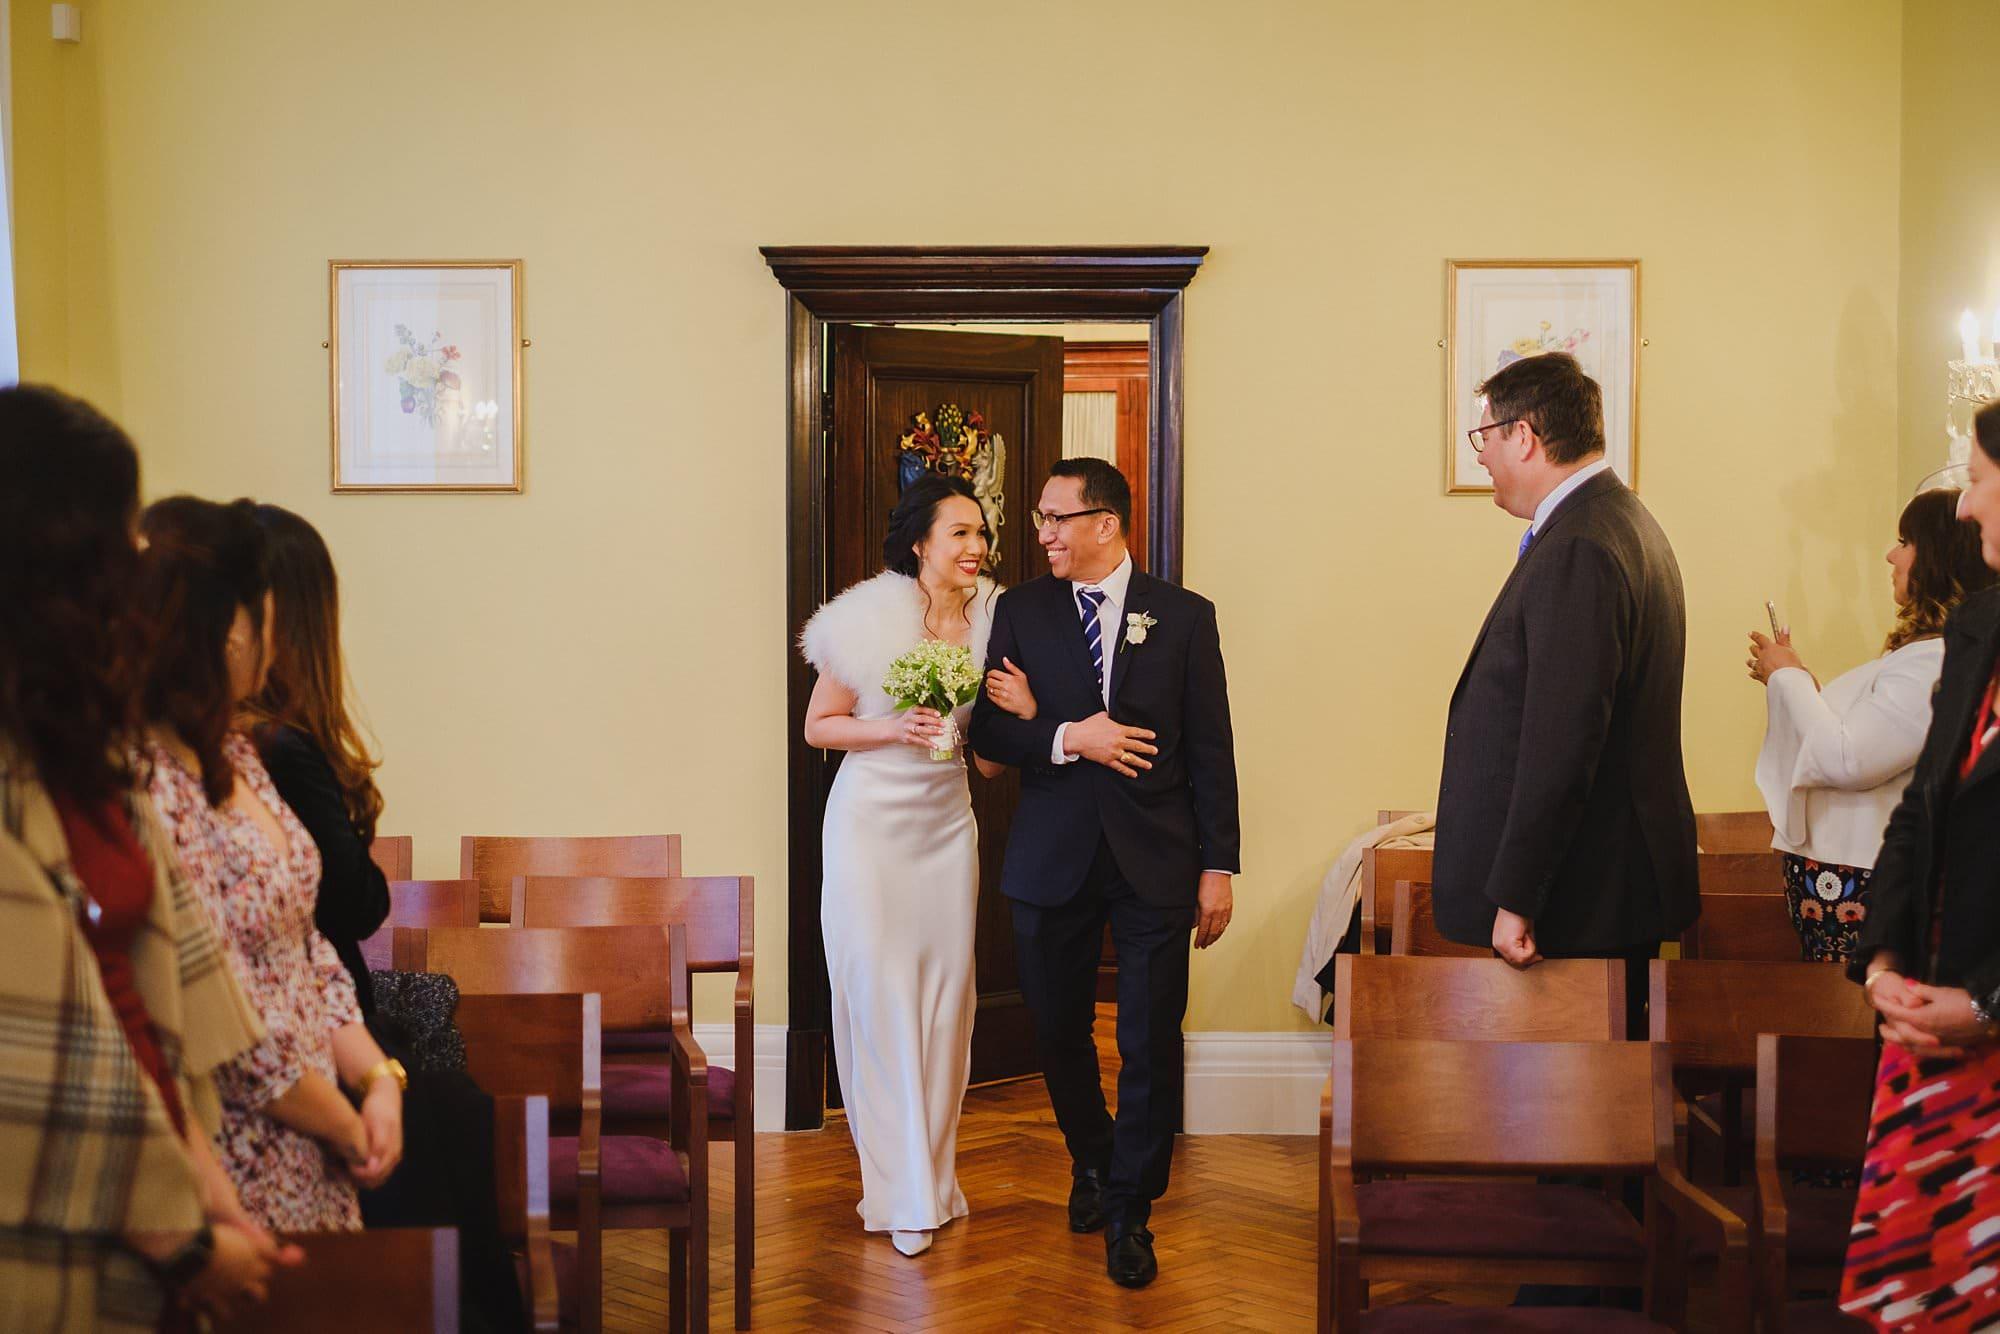 chelsea old town hall wedding photographer st 034 - Stephanie & Tim